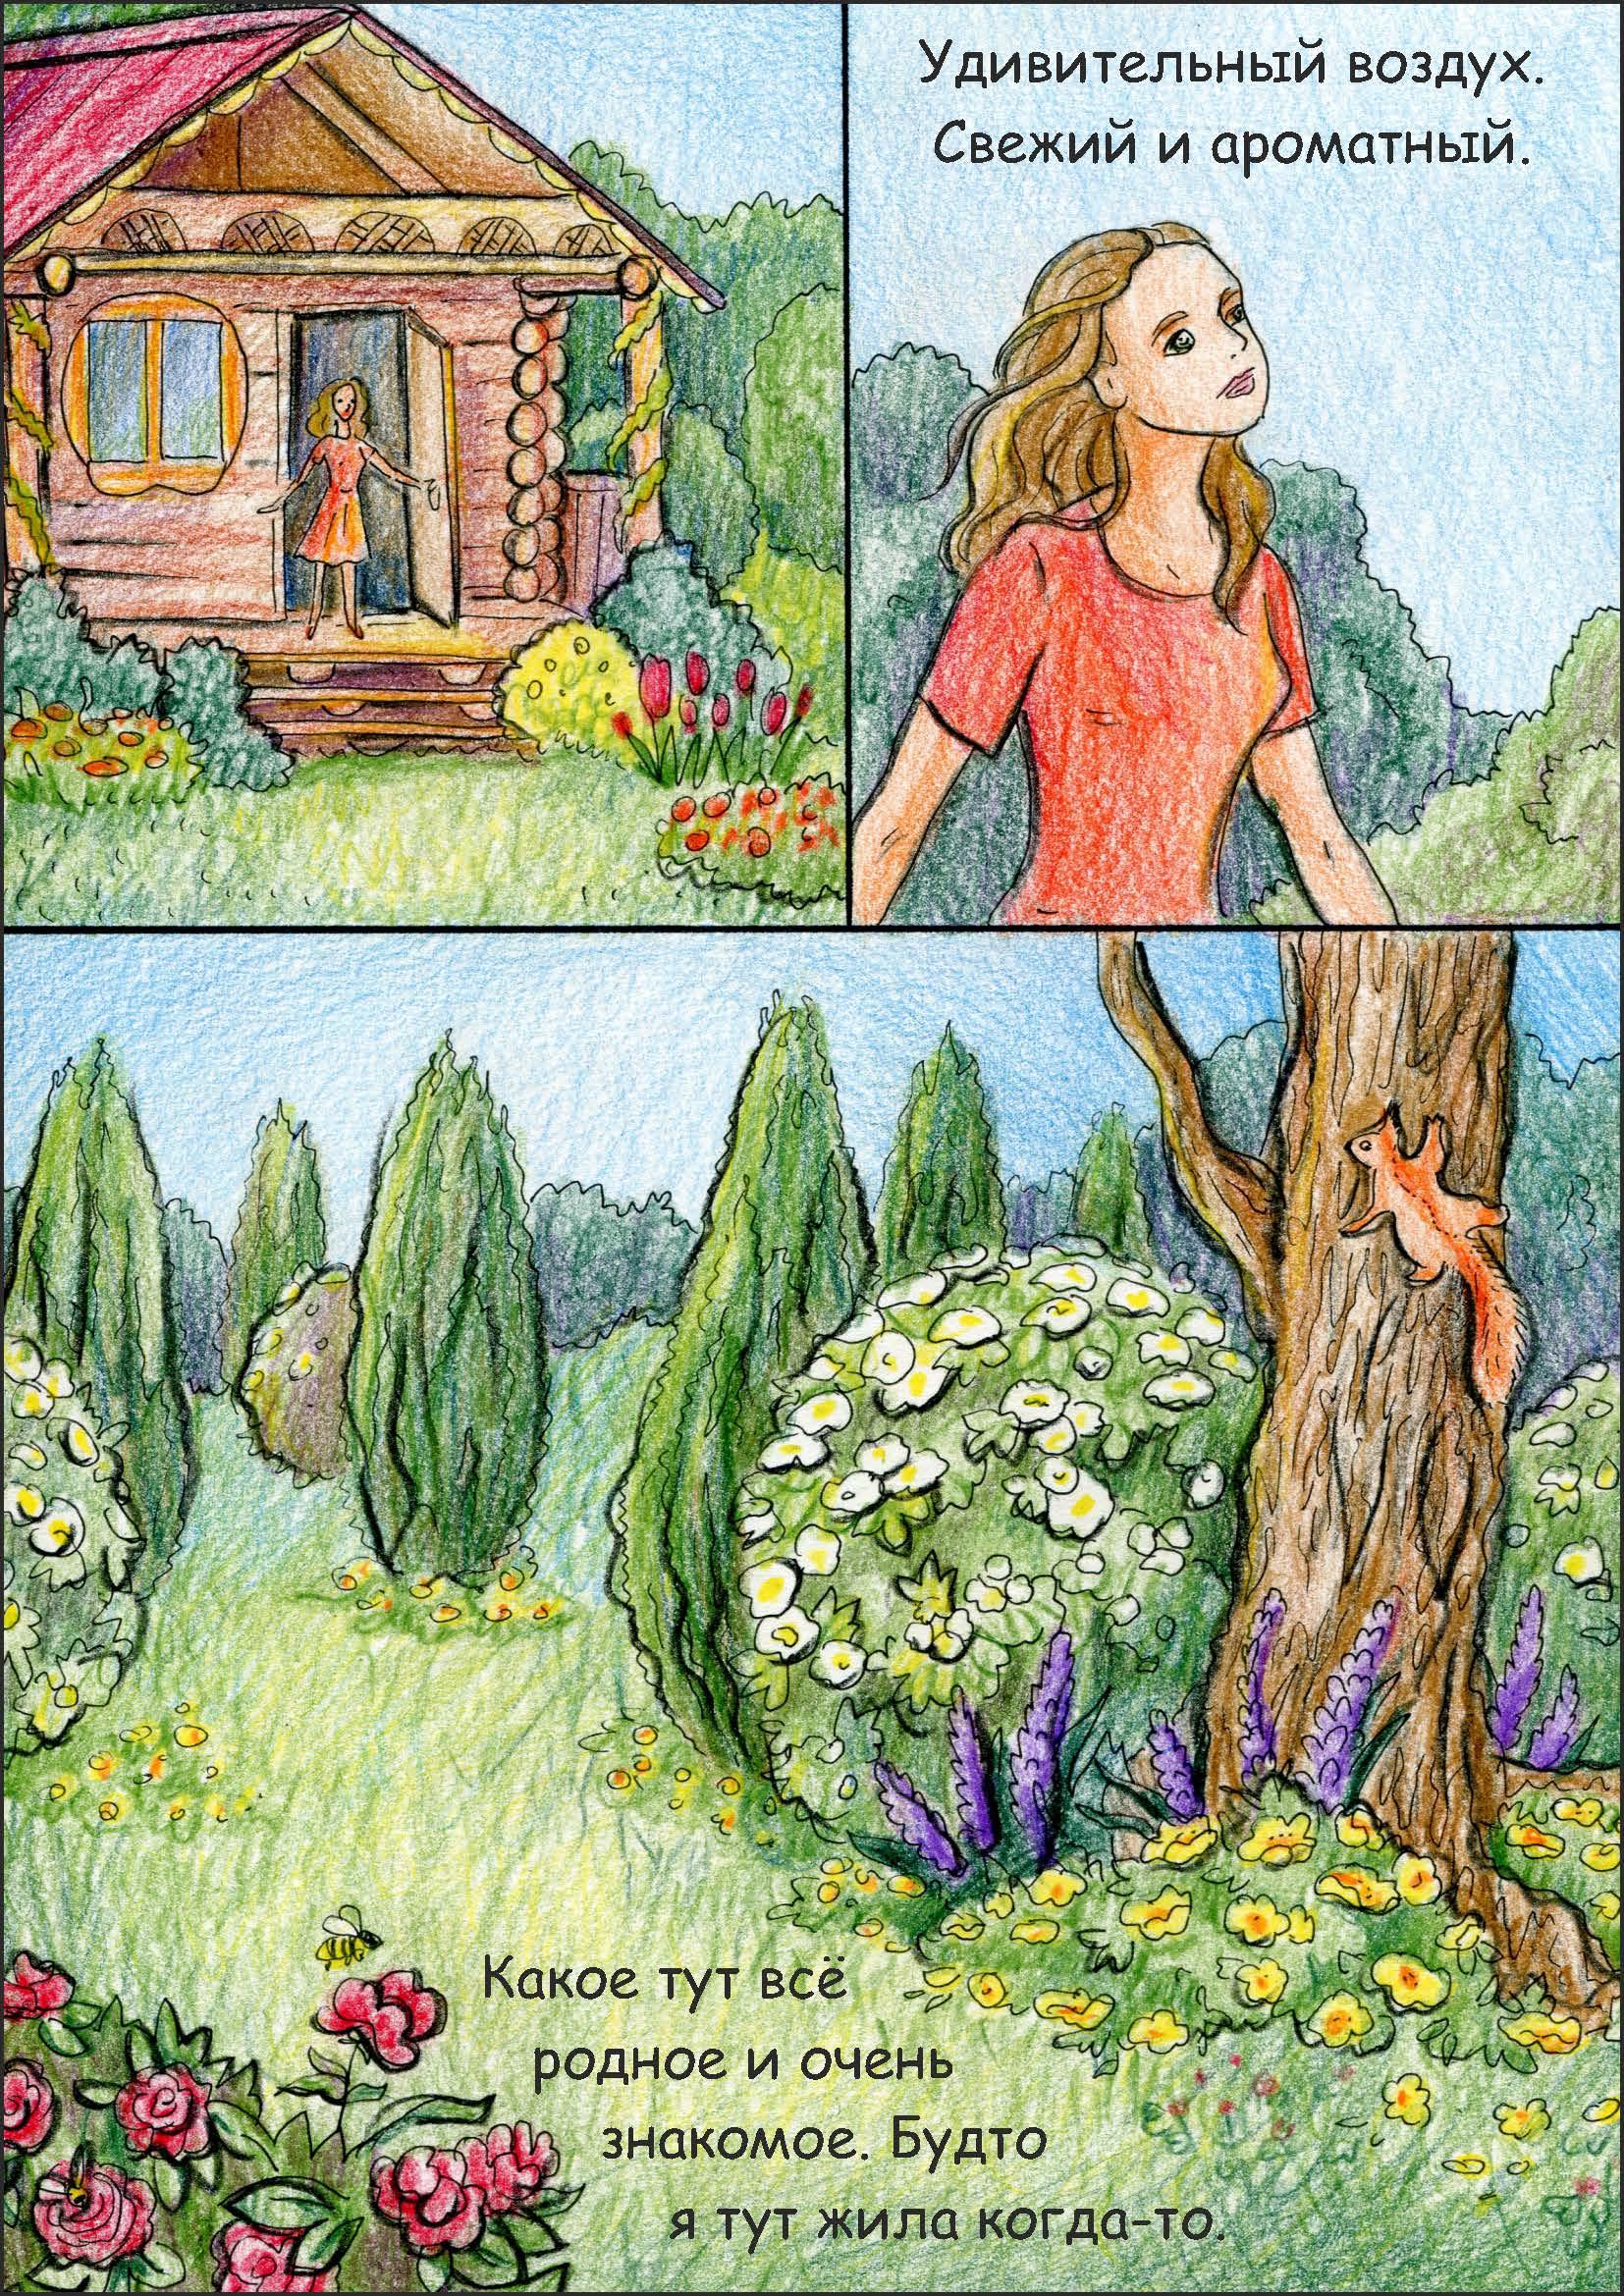 Анна Гейдебрехт. Комикс Зовущая мечта (10).jpg